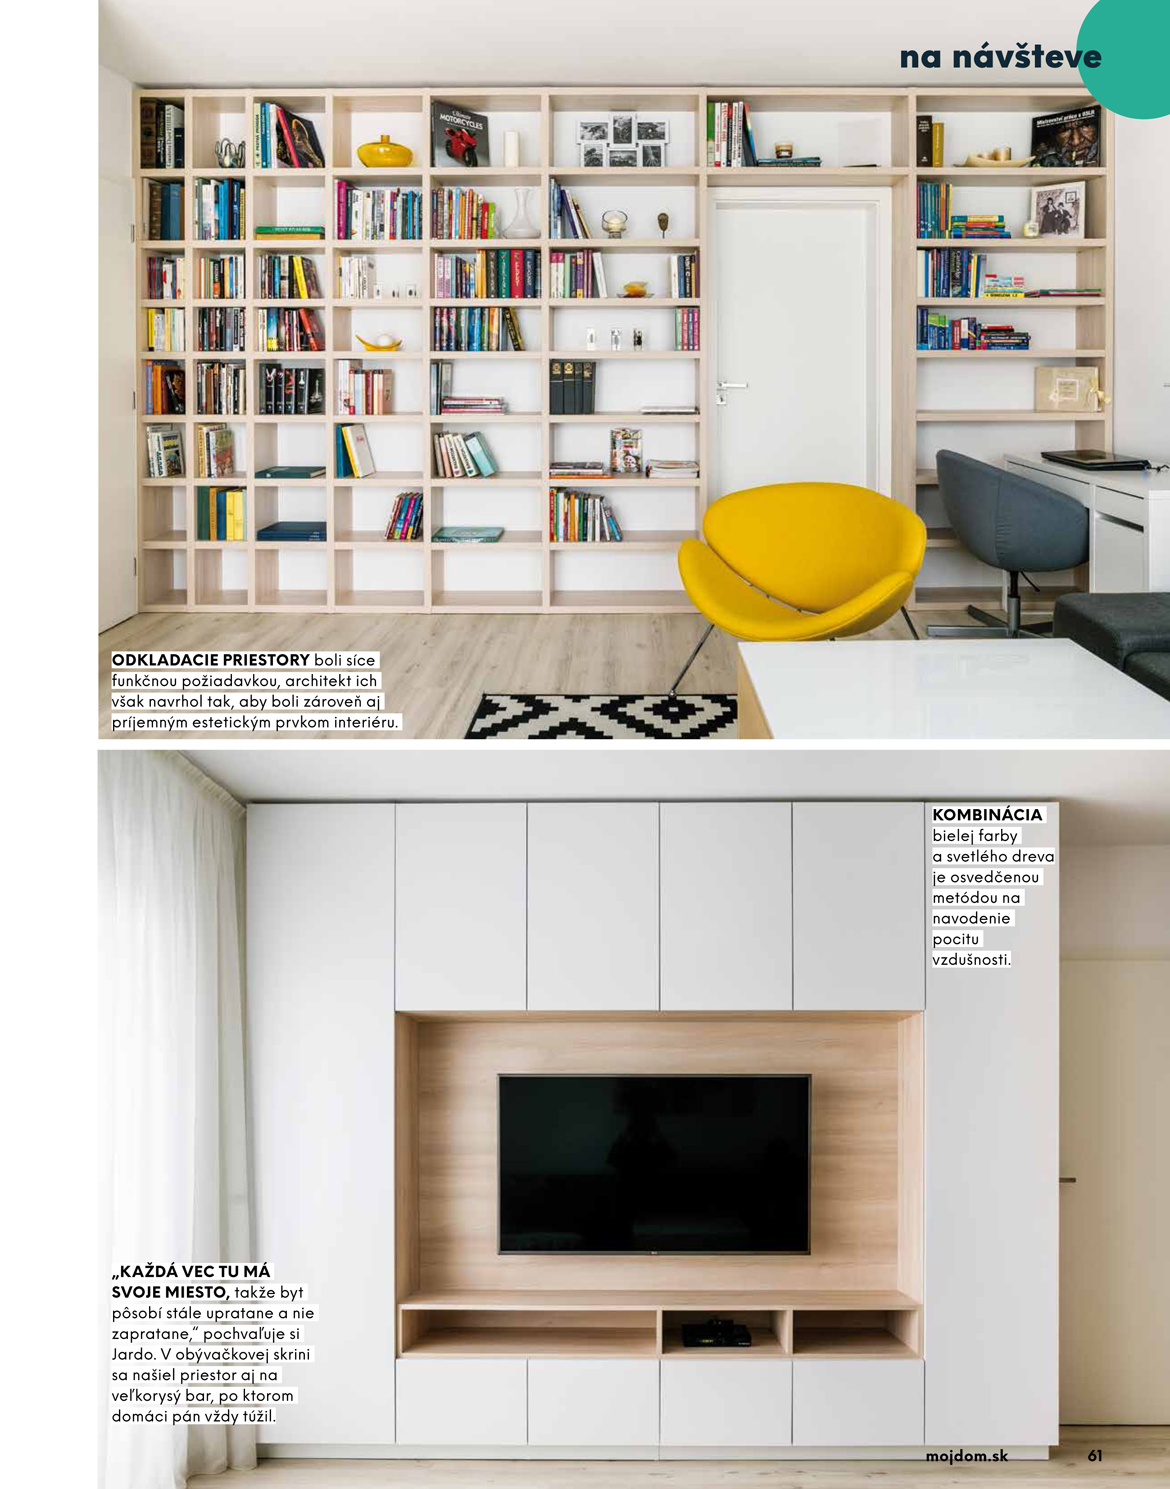 007-byt-cachtice-rekonstrukcia-interier-mojdom-pavlech-architekti